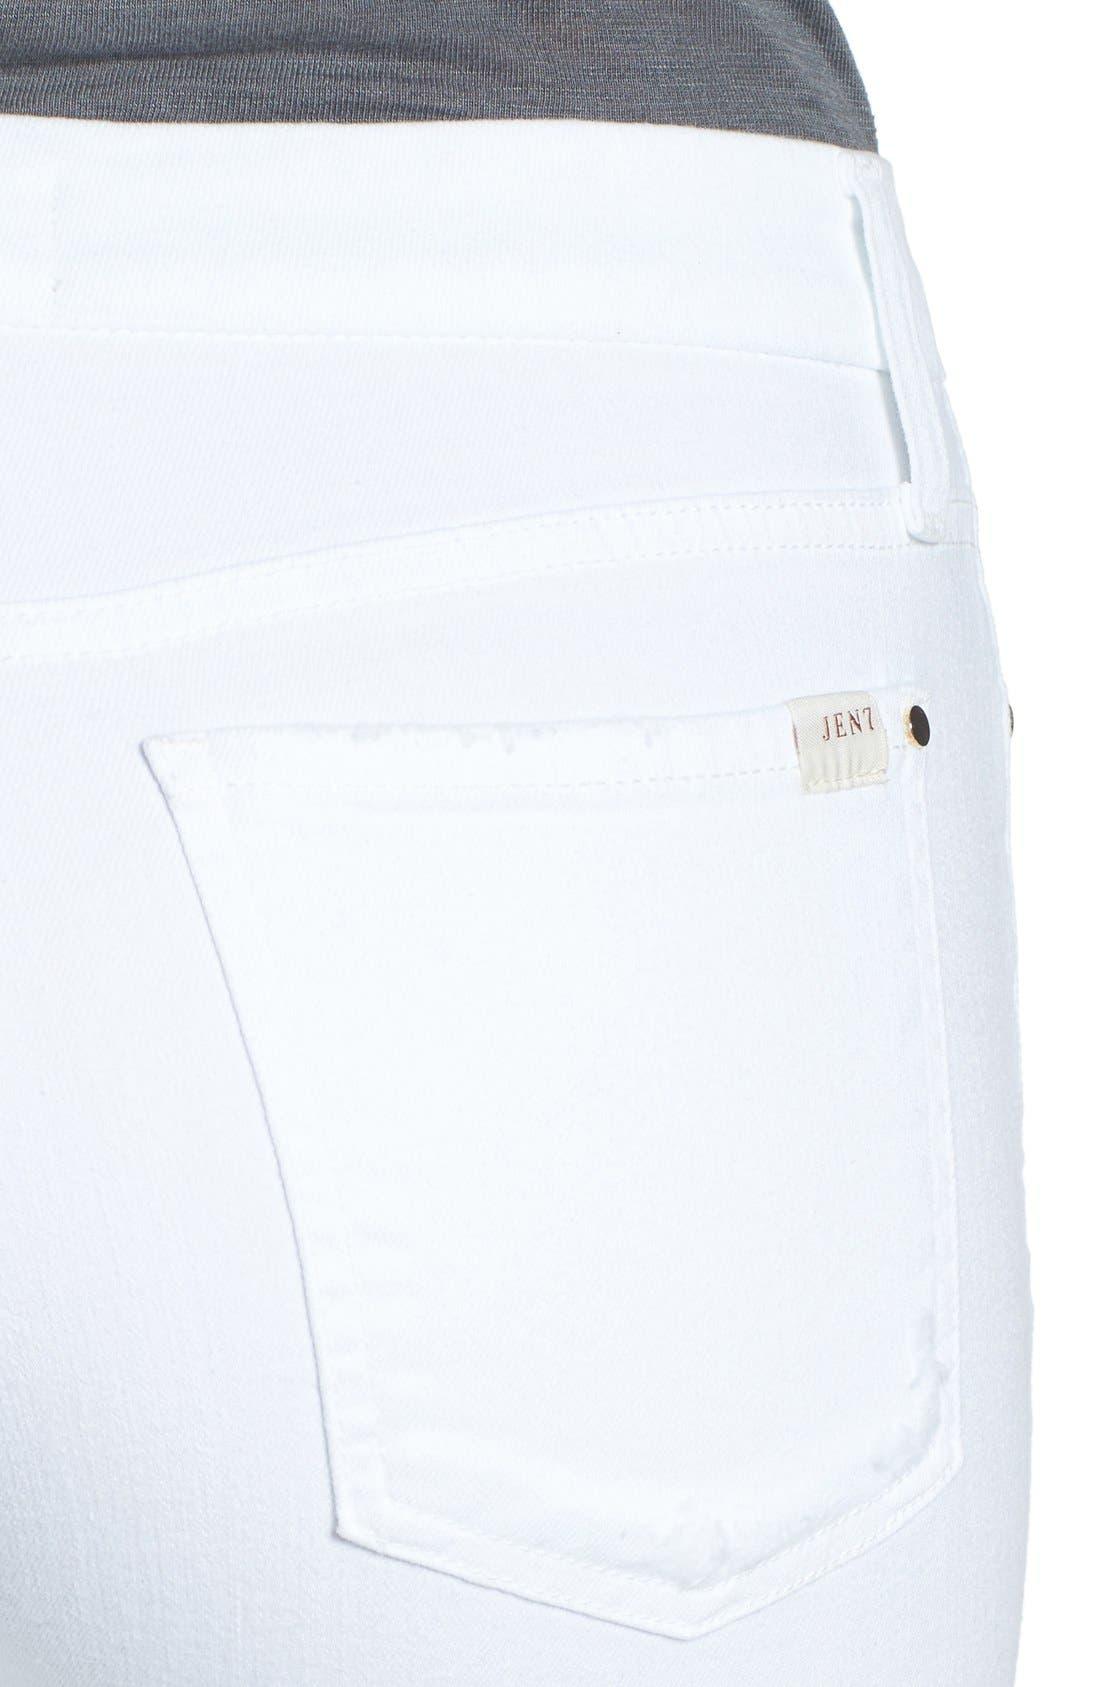 Release Hem Stretch Skinny Ankle Jeans,                             Alternate thumbnail 4, color,                             WHITE DENIM